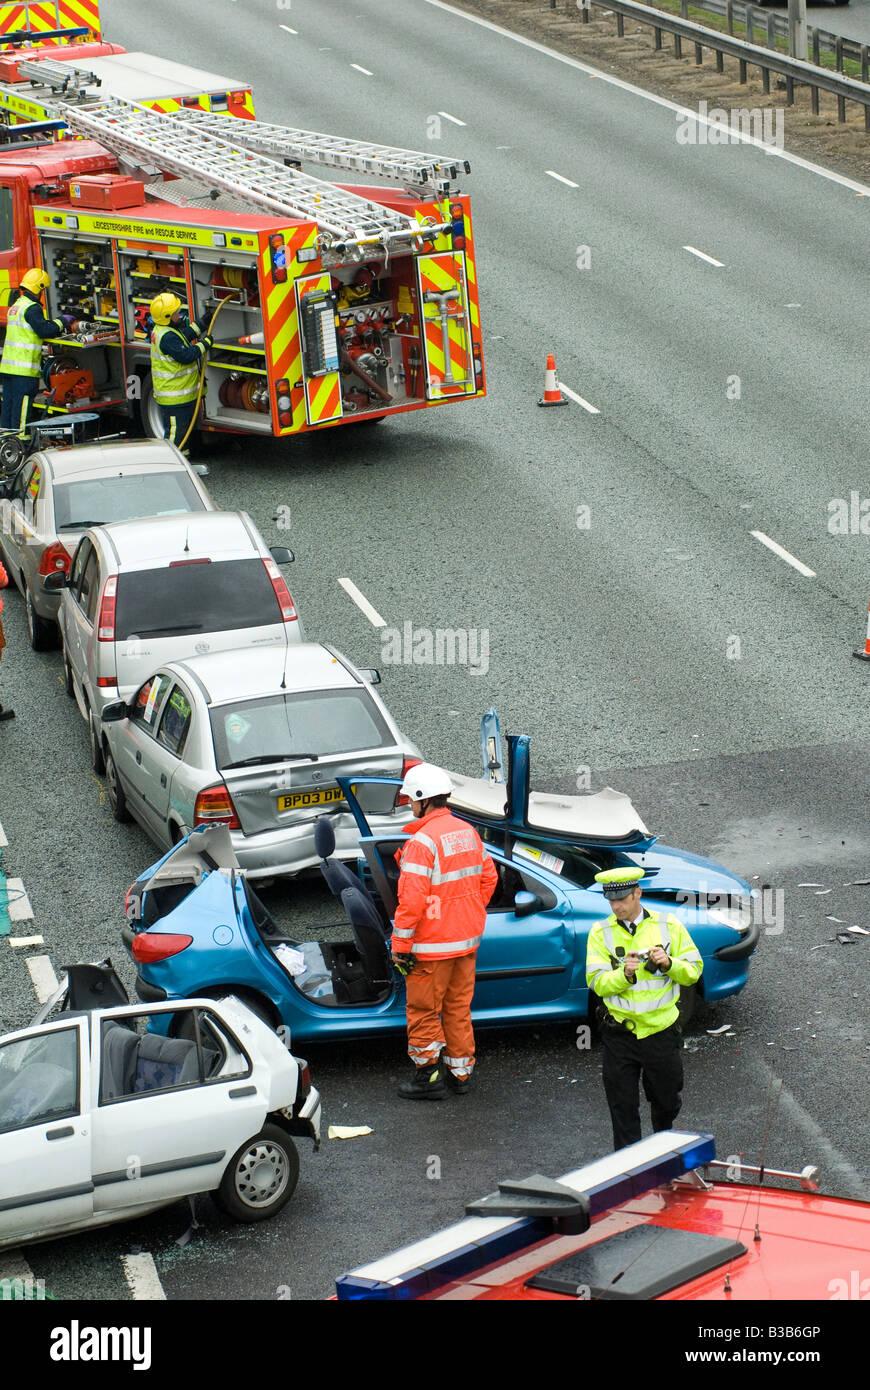 Crash On Motorway Stock Photos & Crash On Motorway Stock Images - Alamy